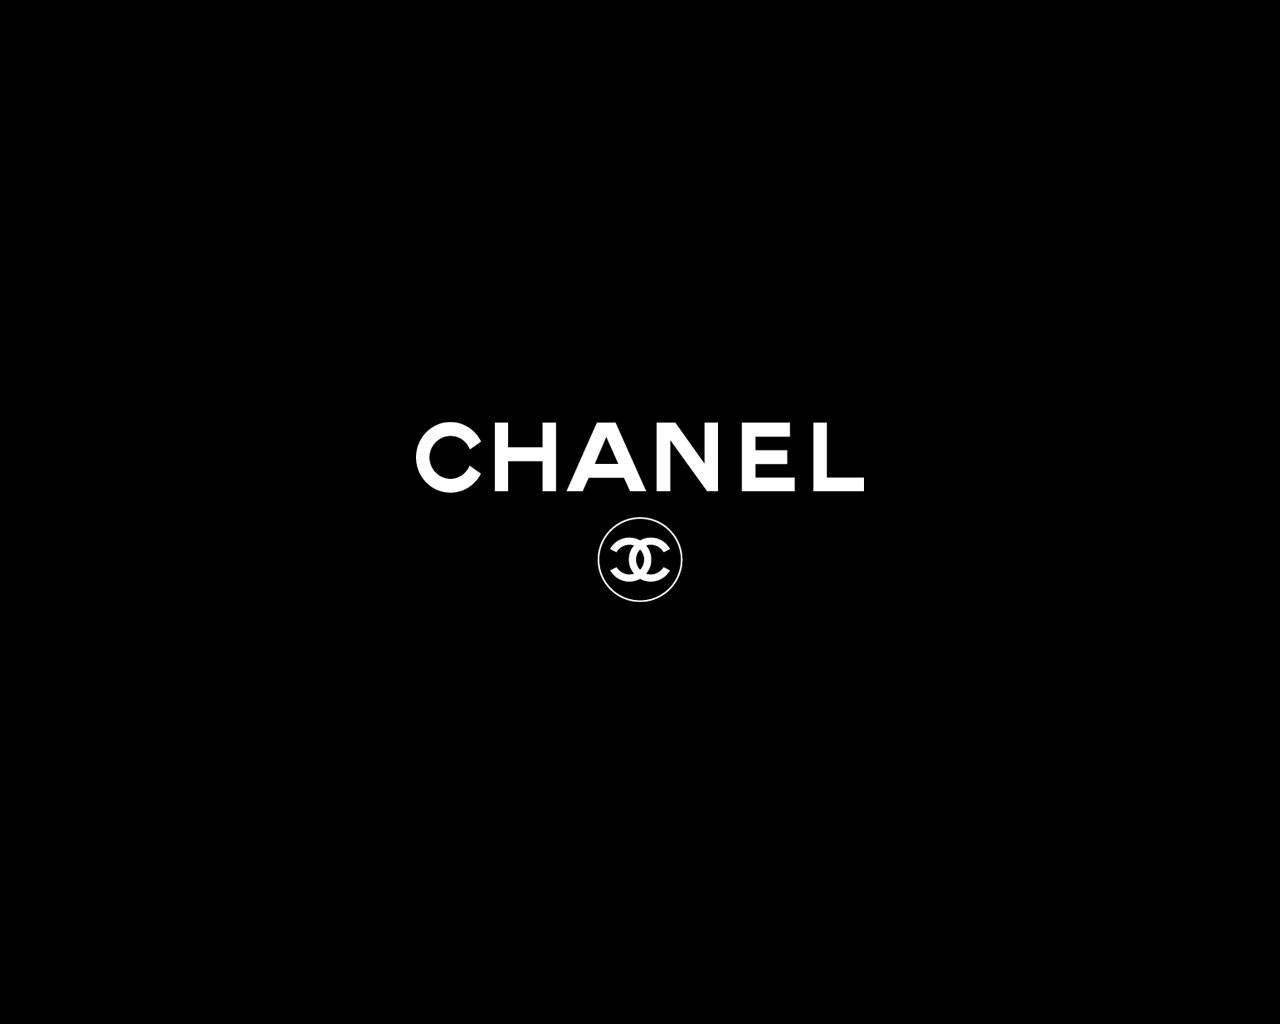 Chanel Wallpaper 3